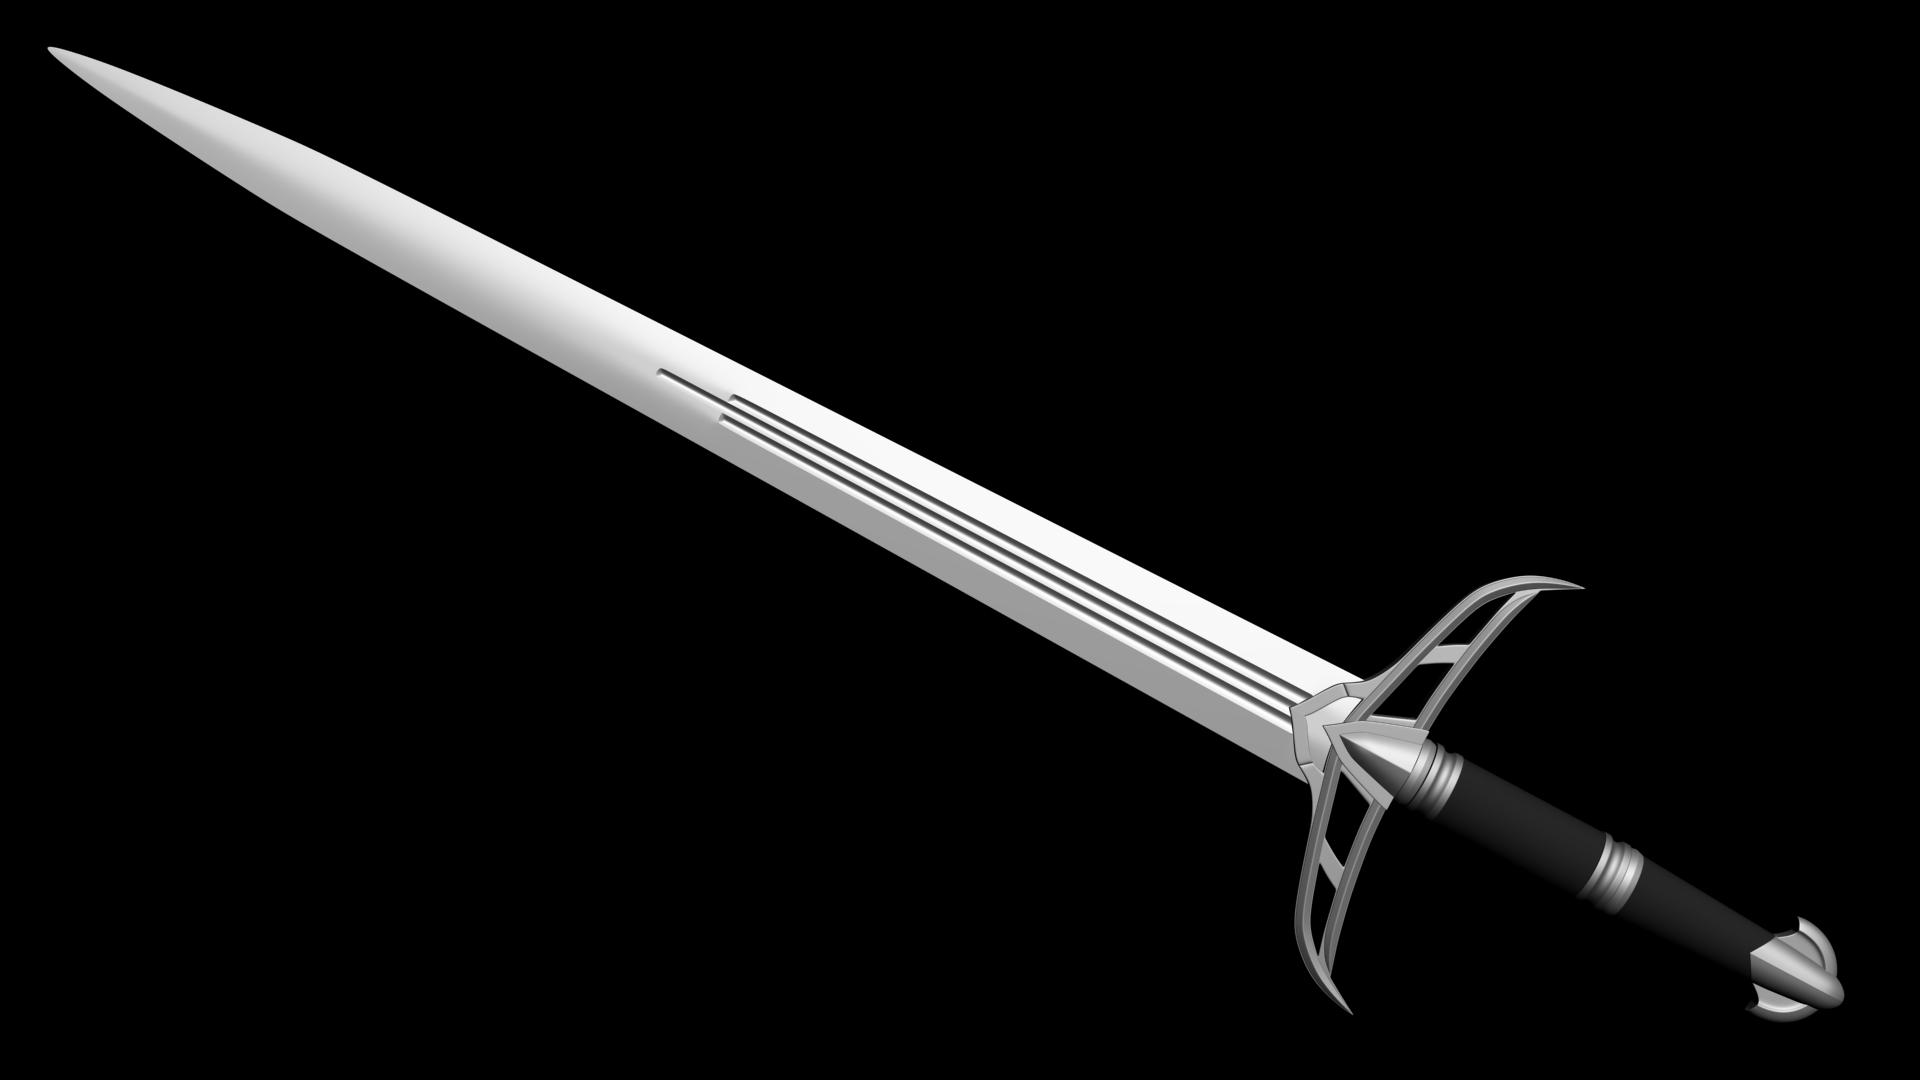 Sword Pictures